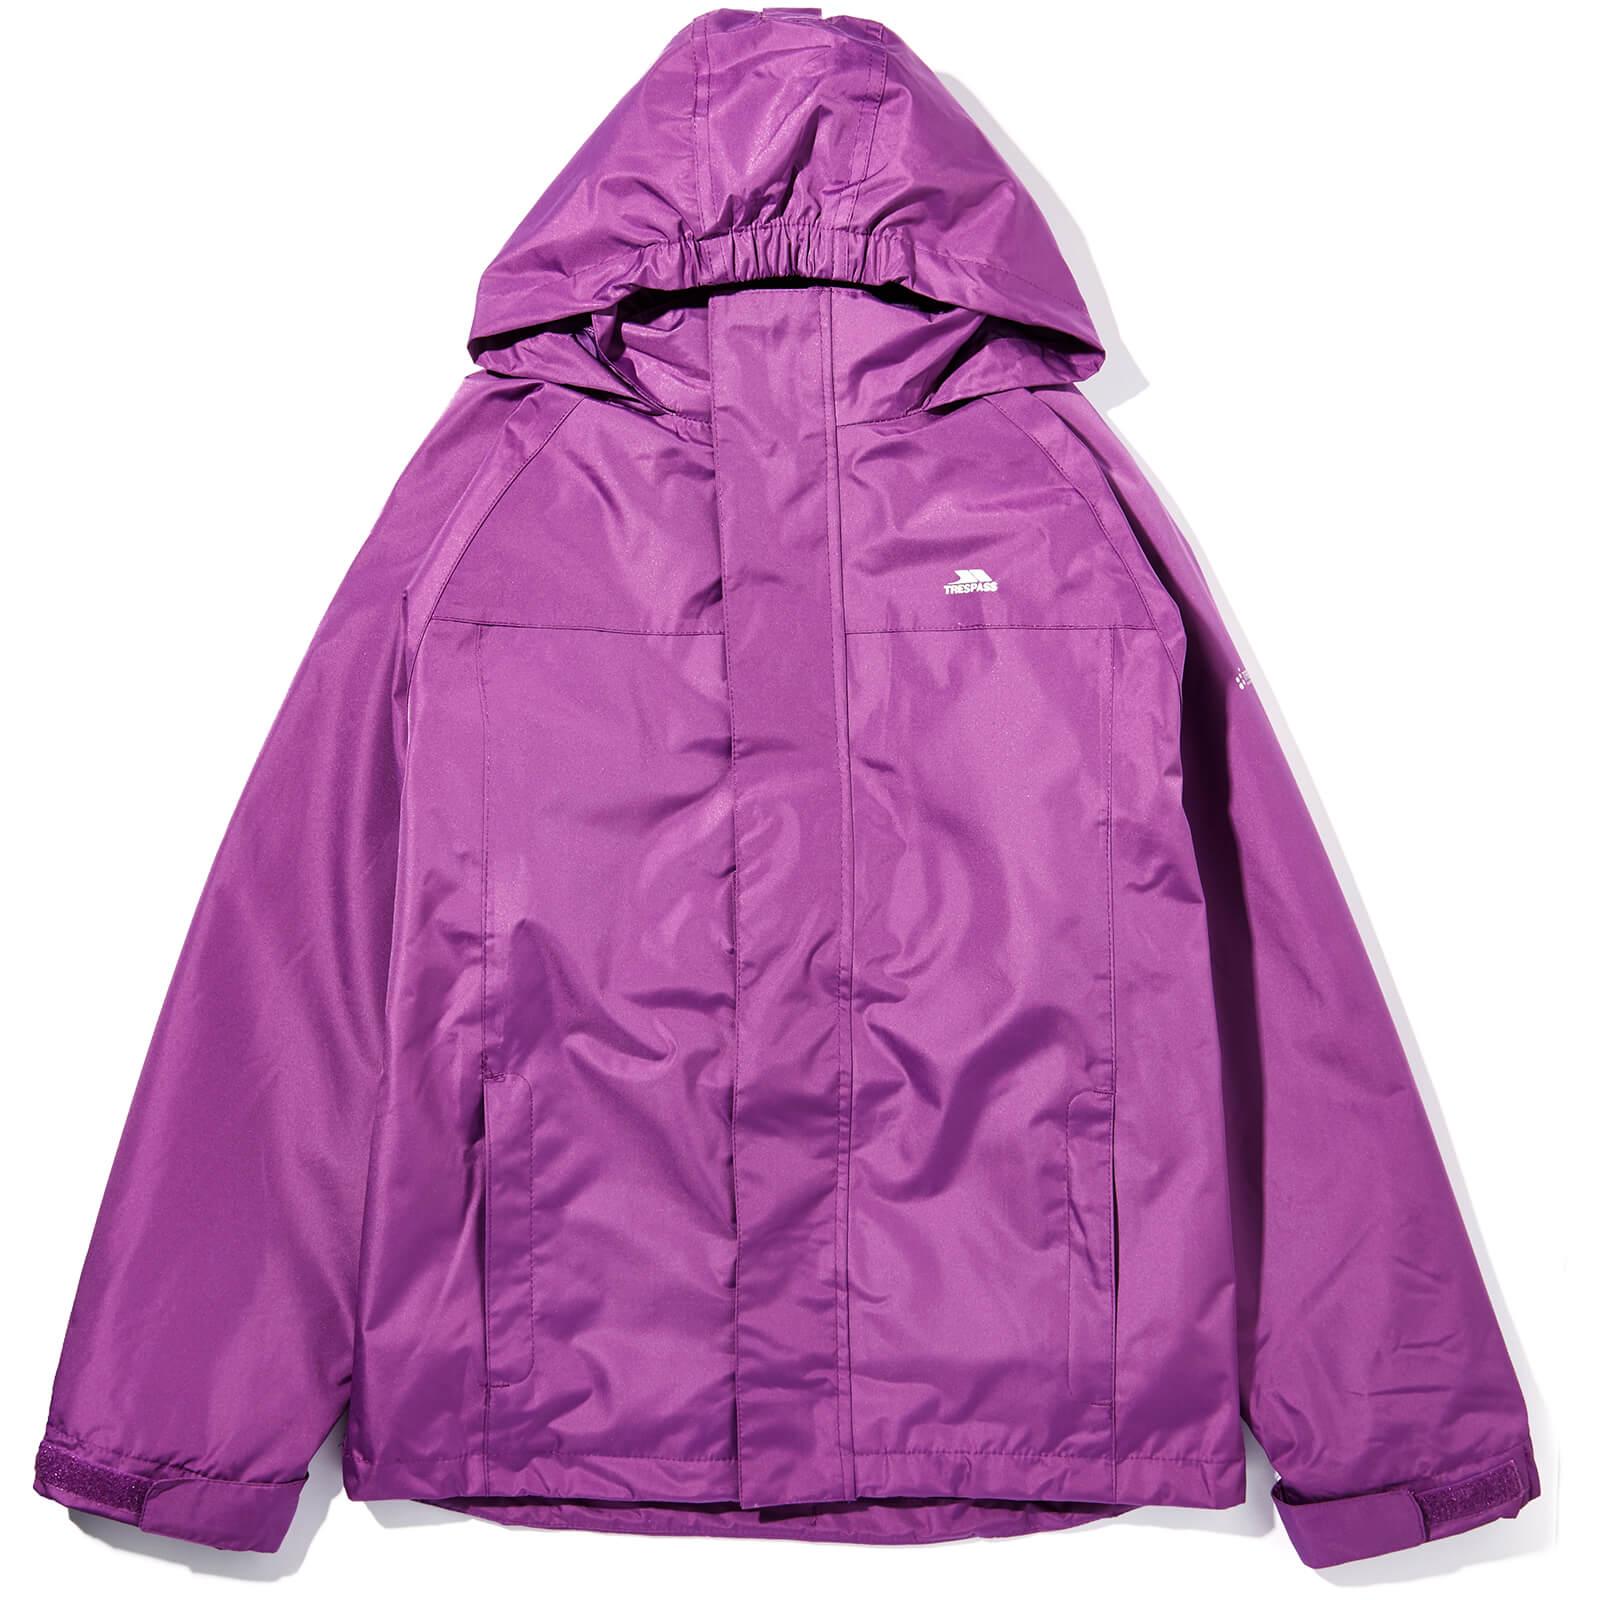 world-wide selection of hot-selling cheap online sale Trespass Girls' Skydive Waterproof 3-in-1 Jacket - Damson